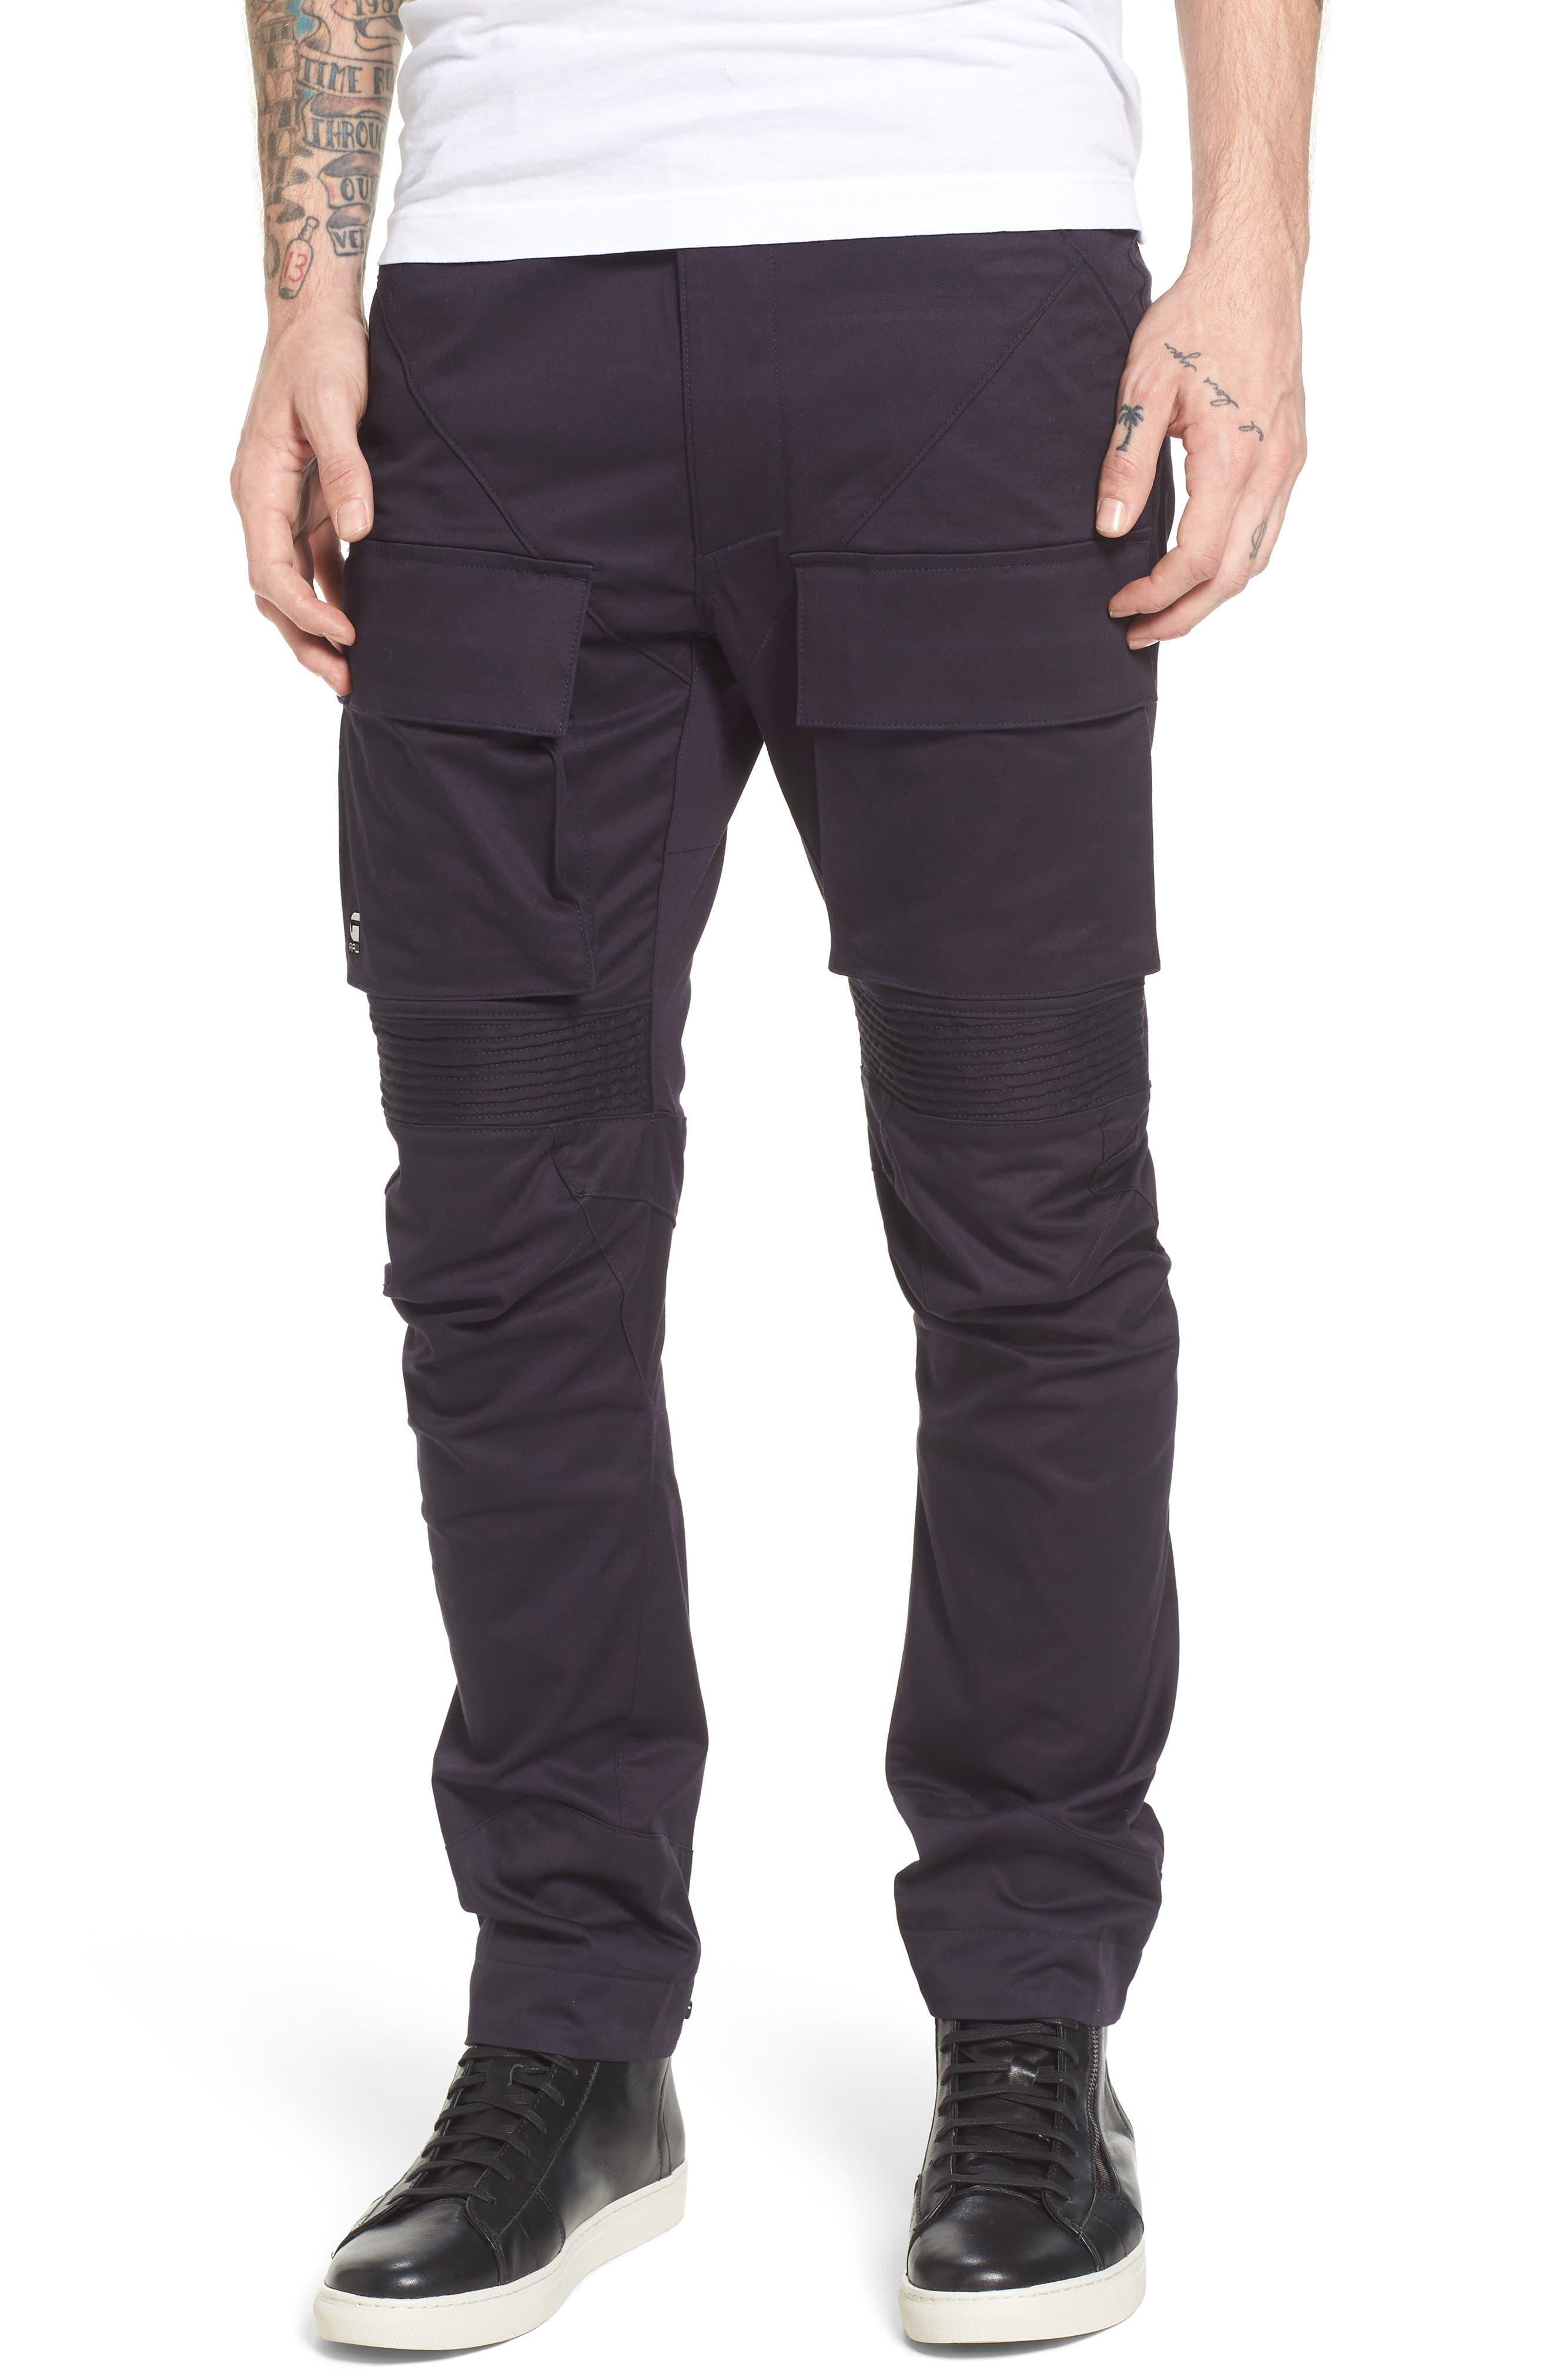 Vodan DC Slim Pants,                         Main,                         color, Dark Naval Blue